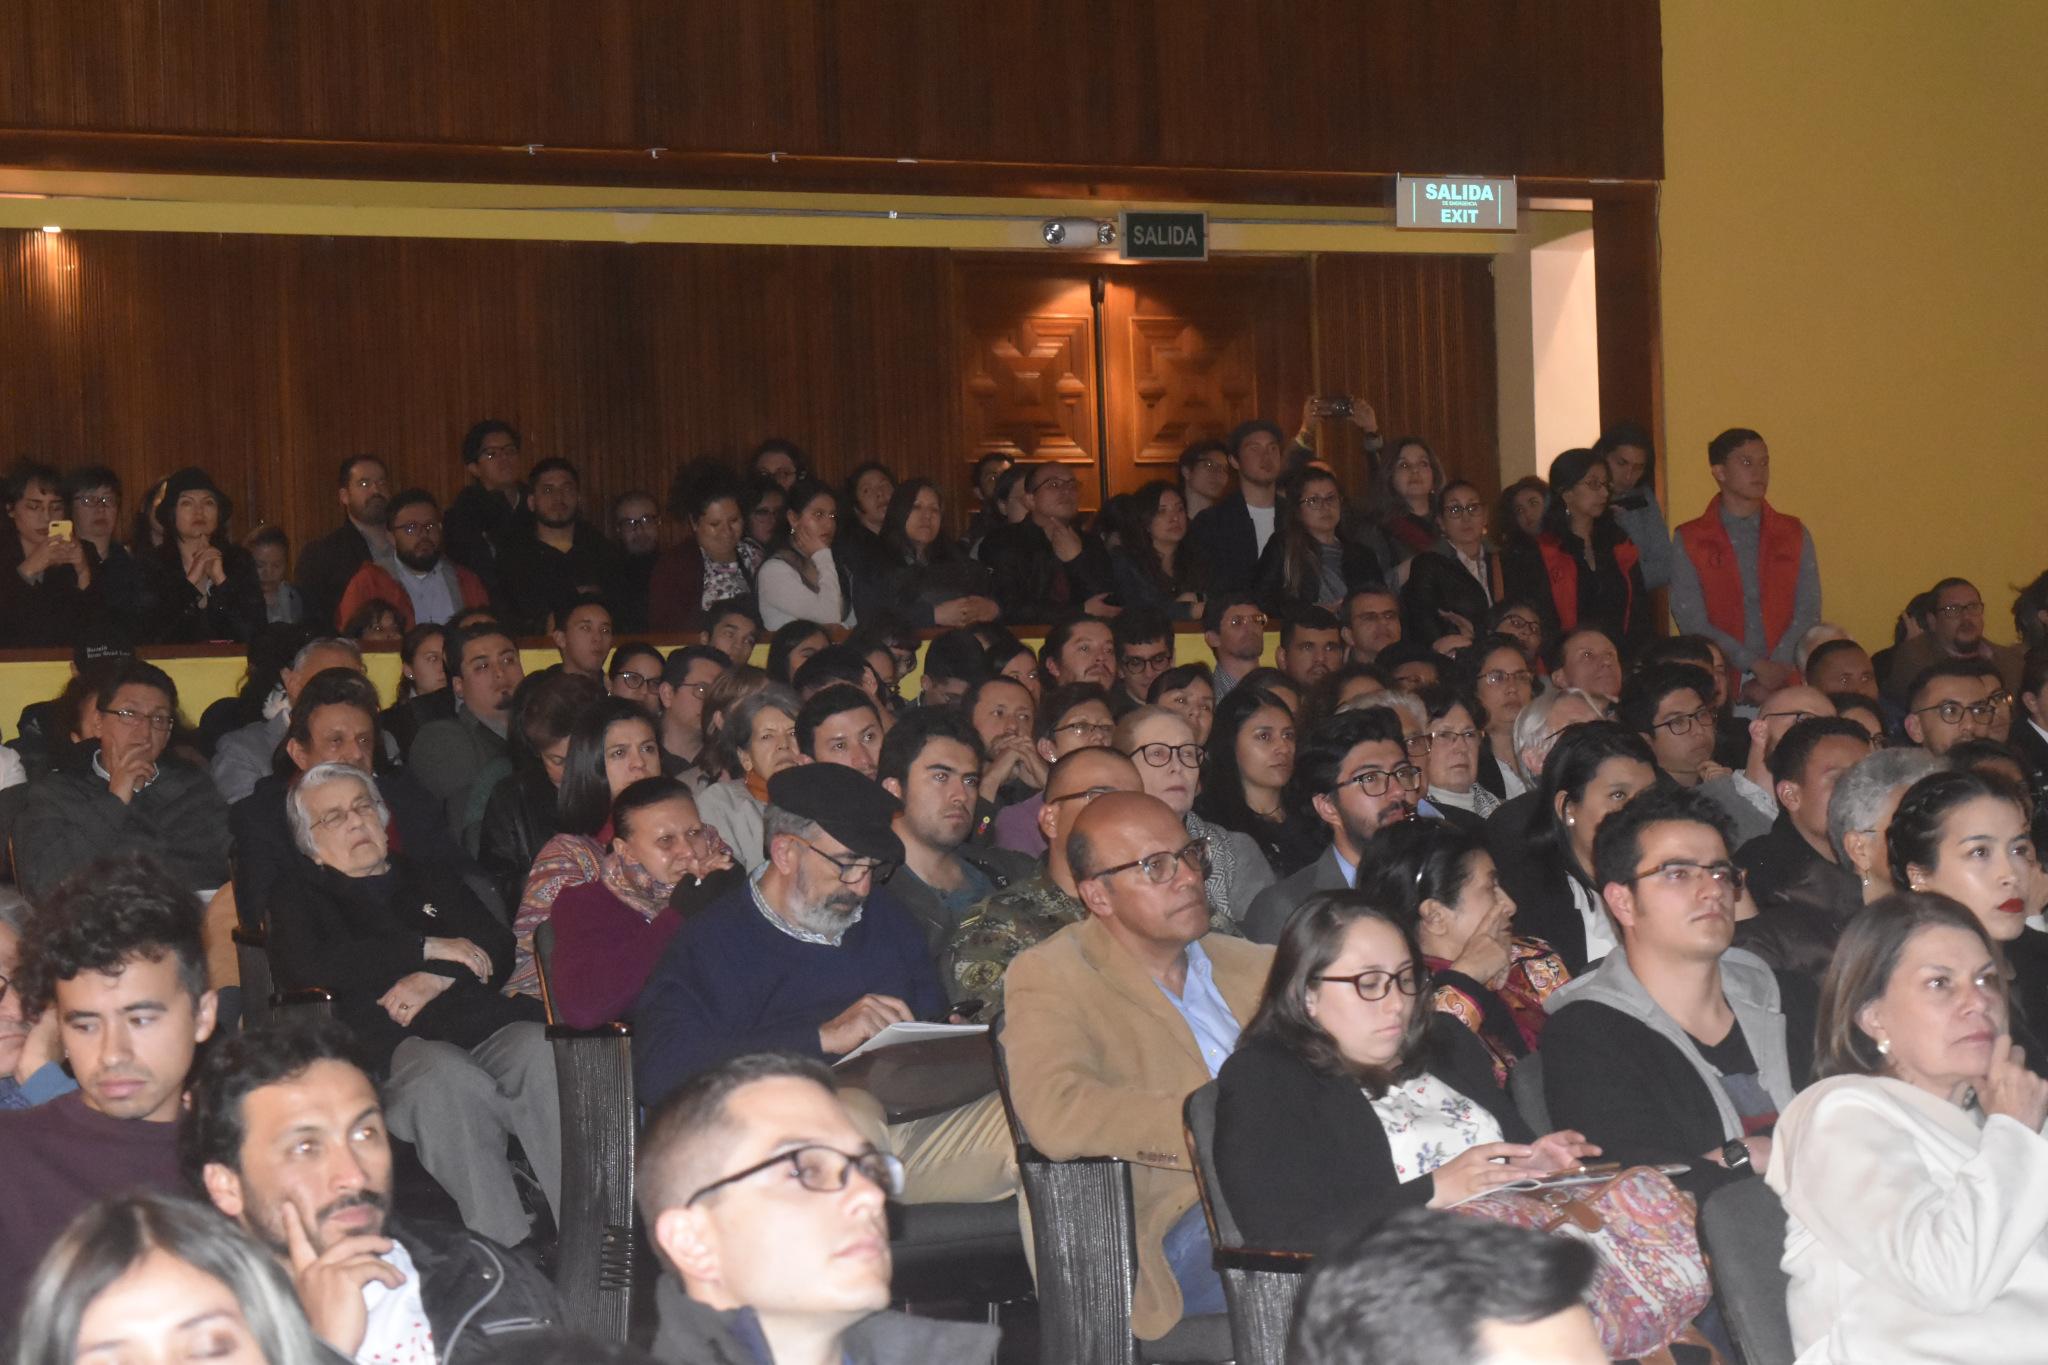 Foto: Camilo Baquero Castellanos/VRI